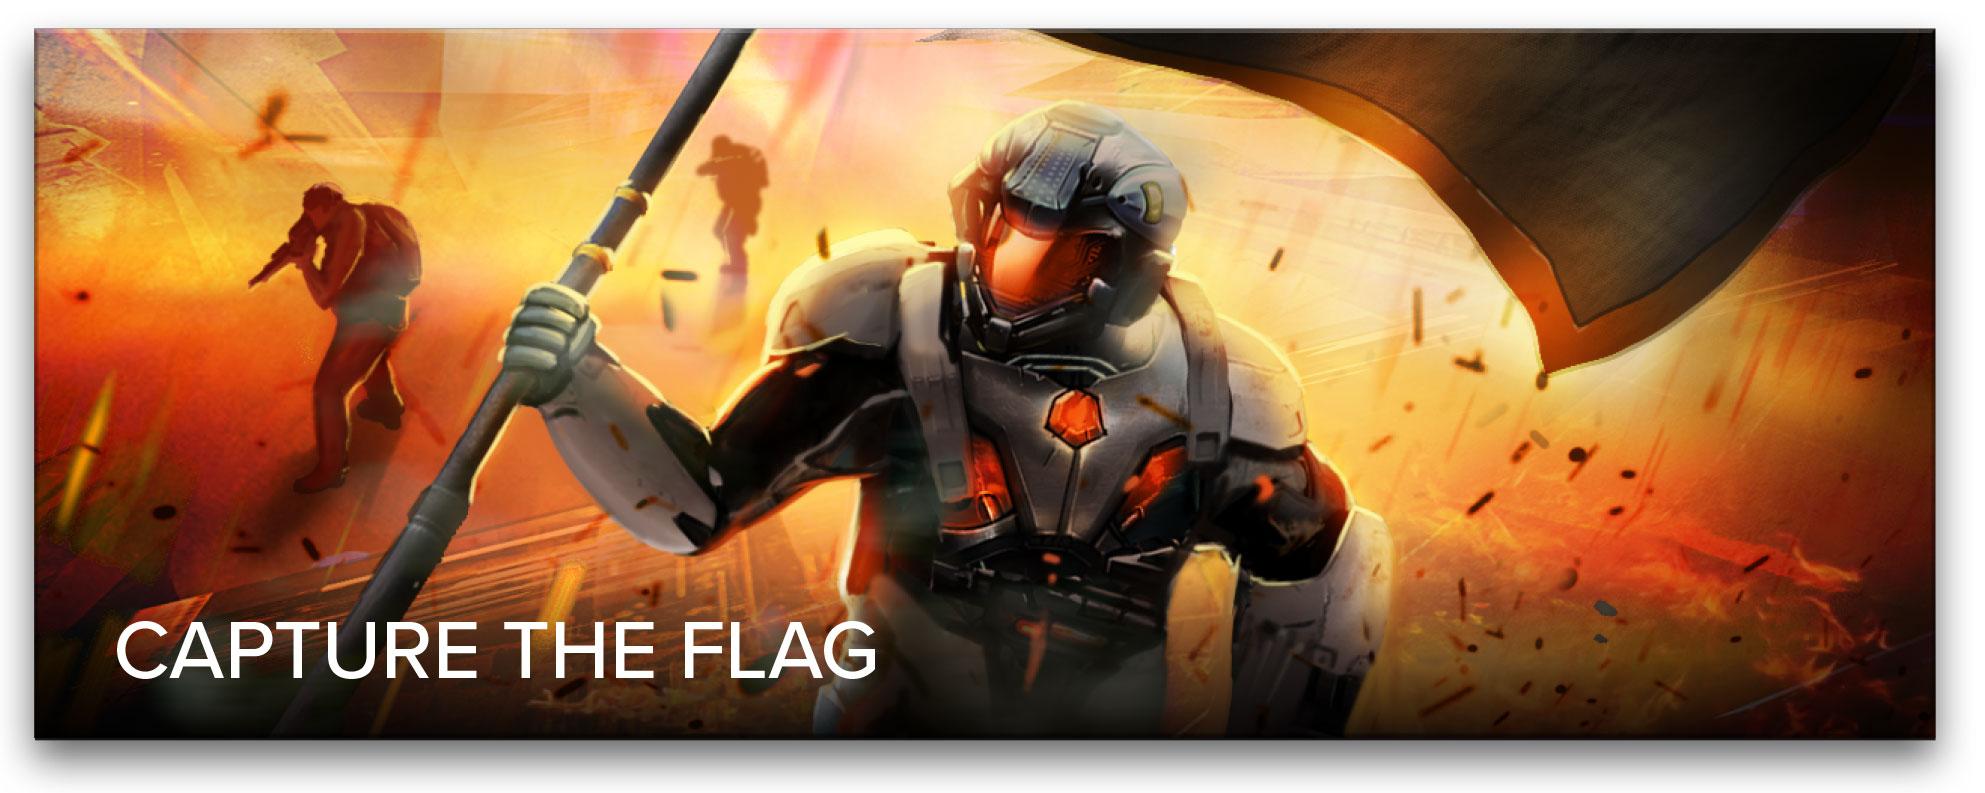 capture-the-flag-laser-tag